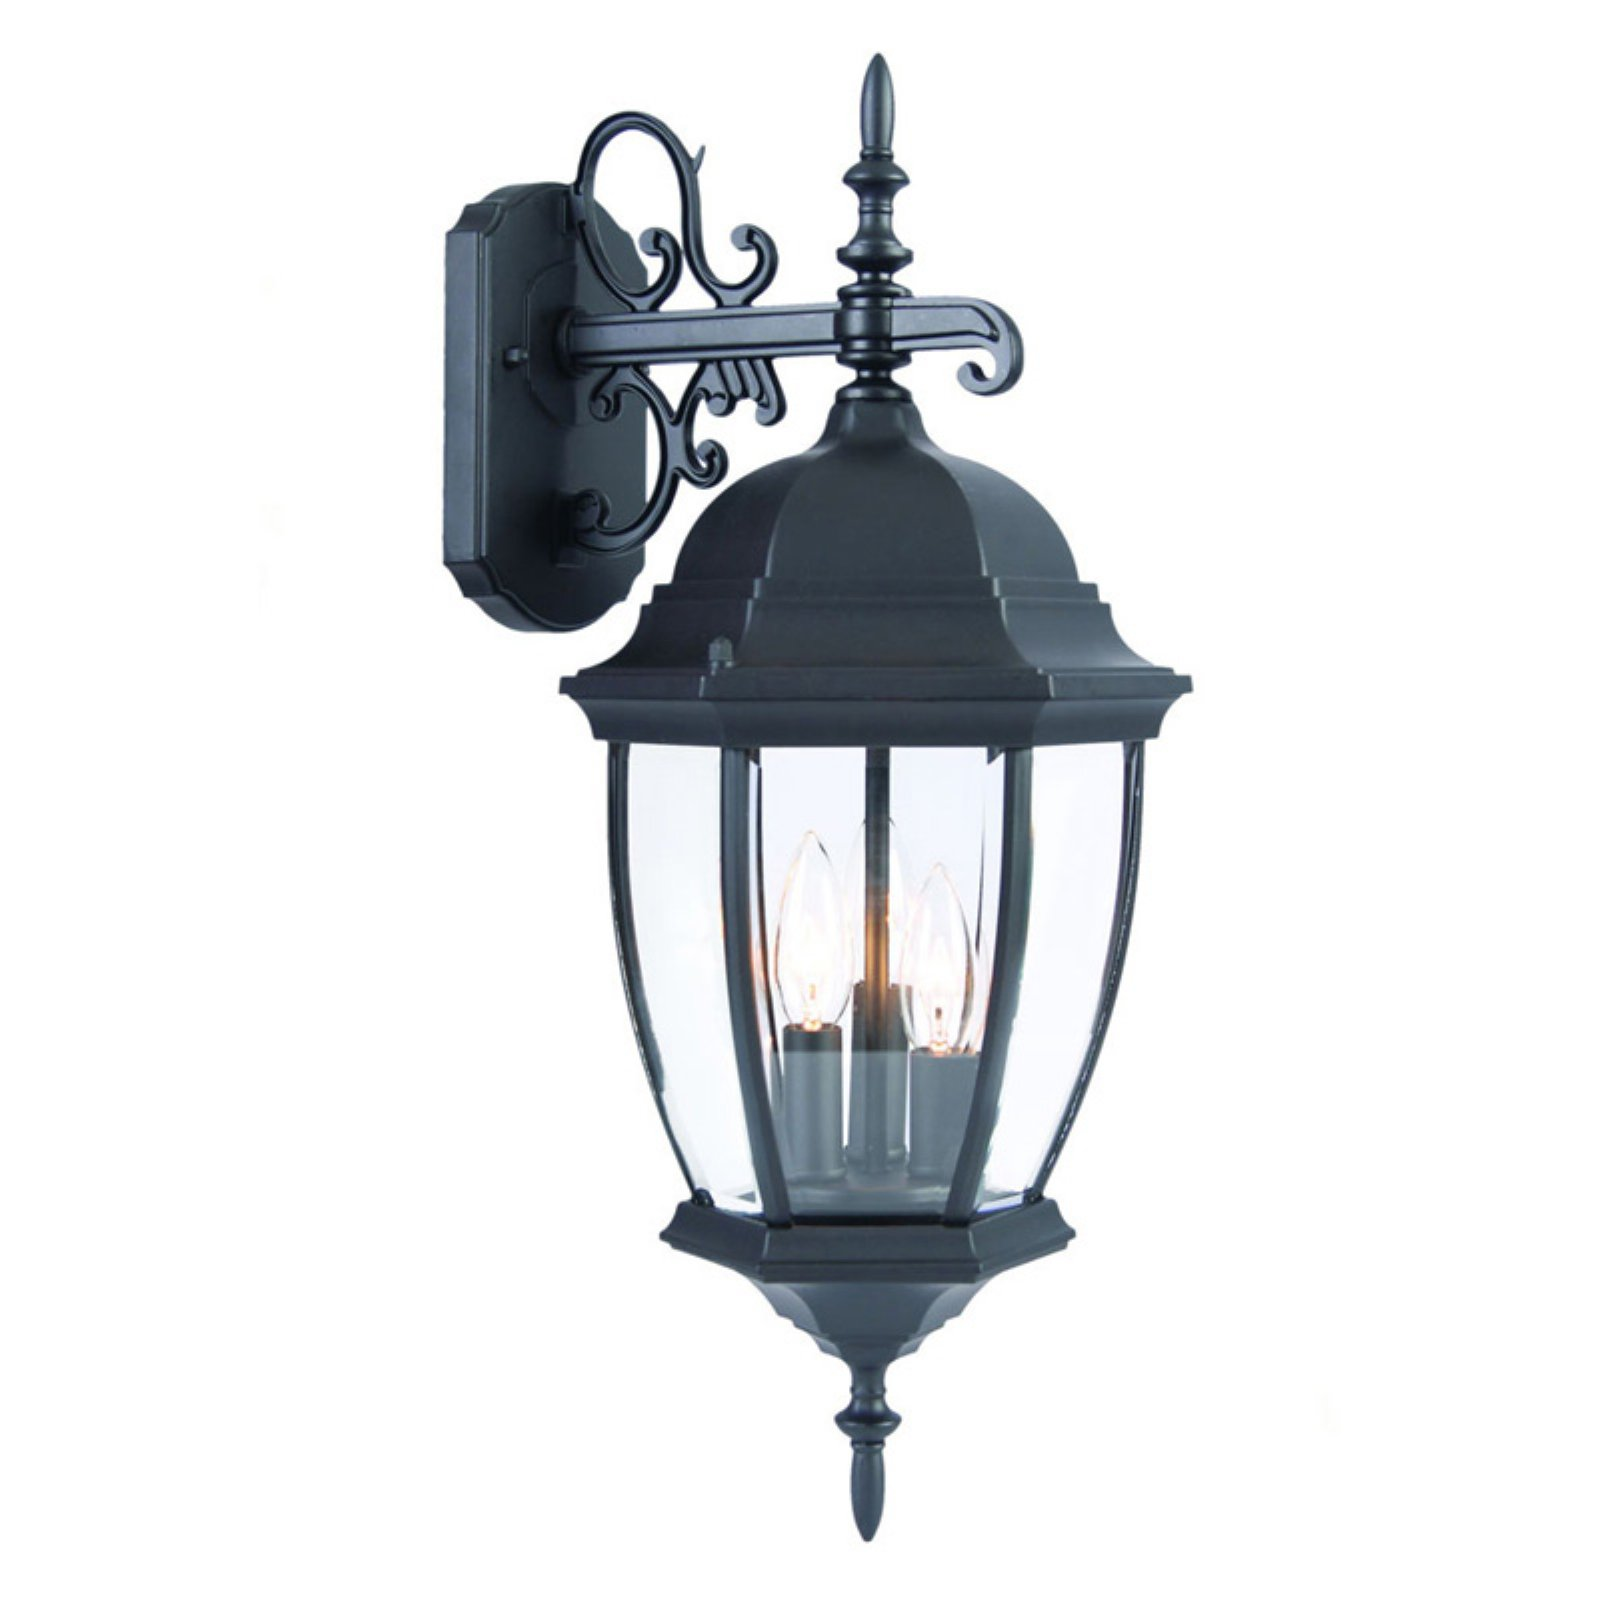 Acclaim Lighting Wexford 3 Light Outdoor Wall Mount Light Fixture